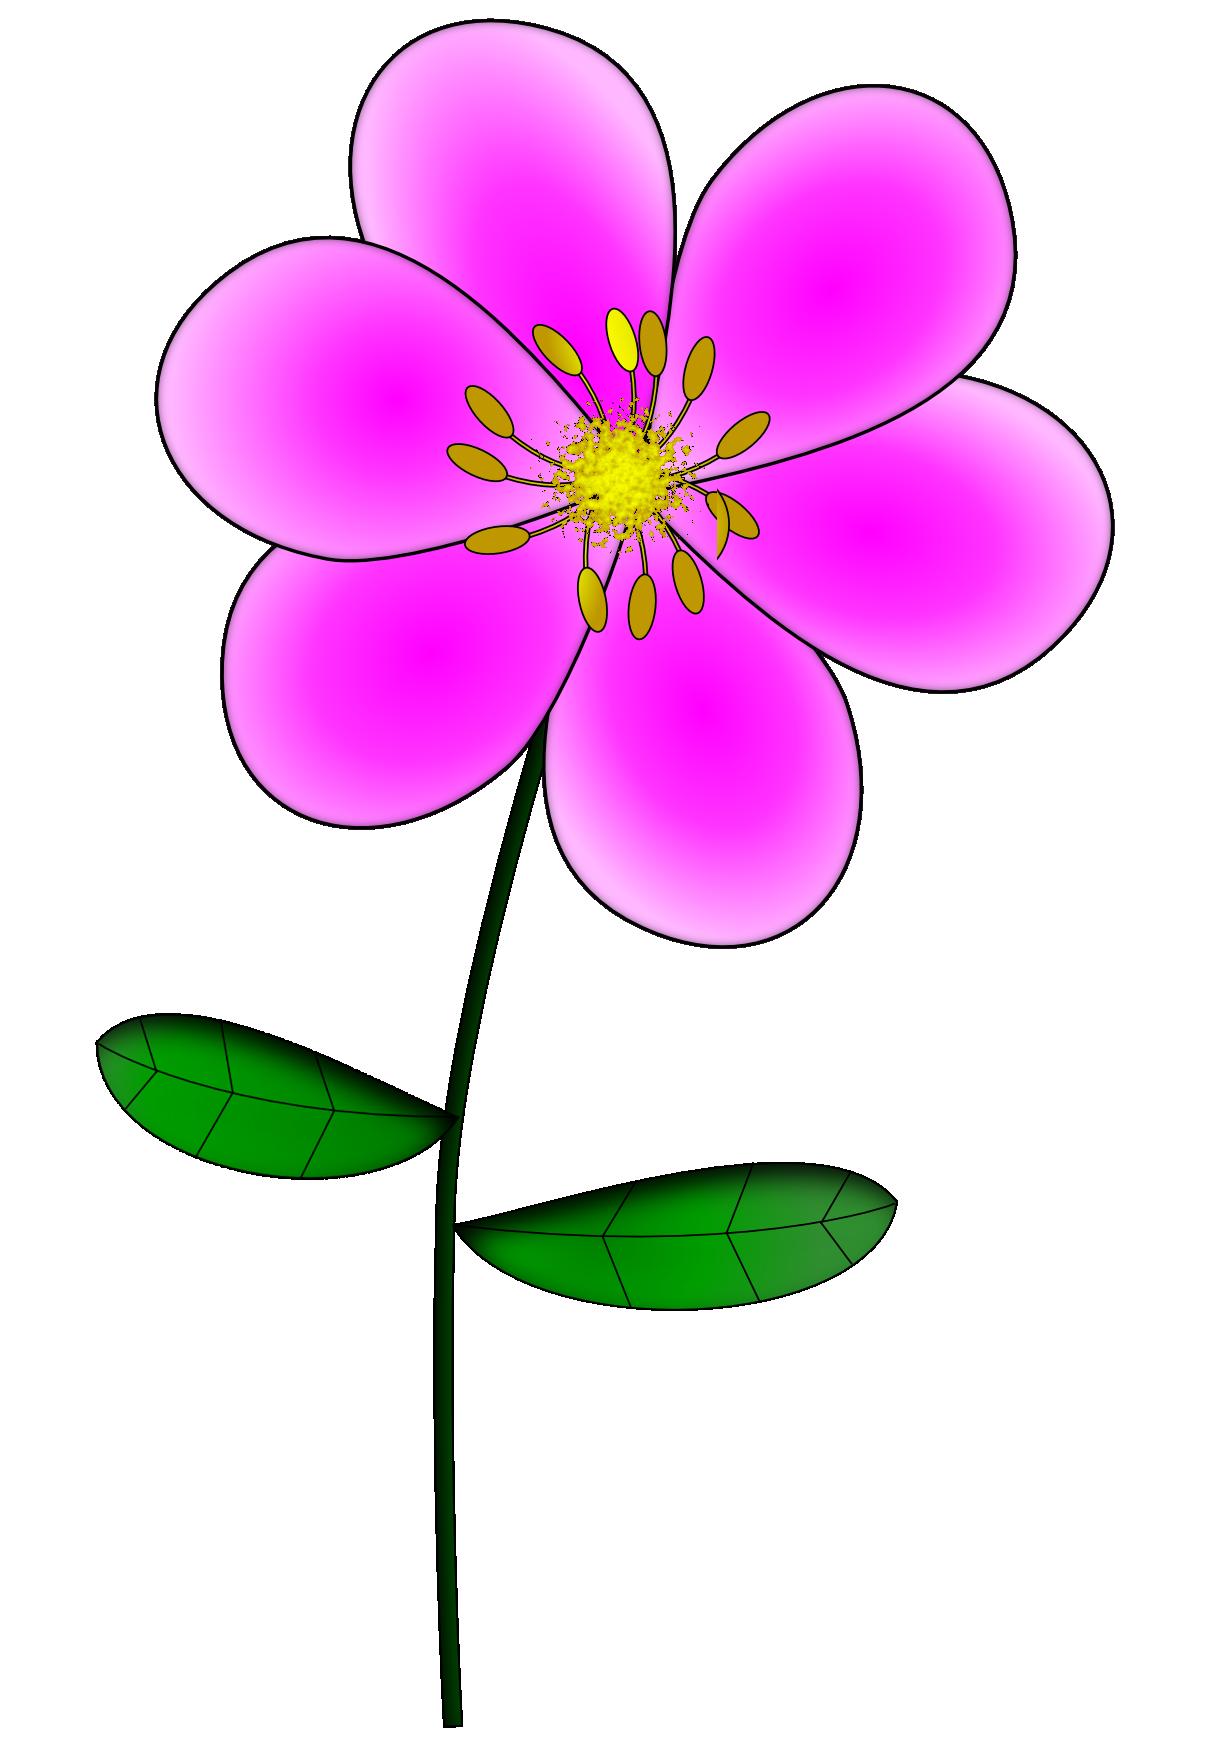 Clipart roses cute. Fl res pinterest image